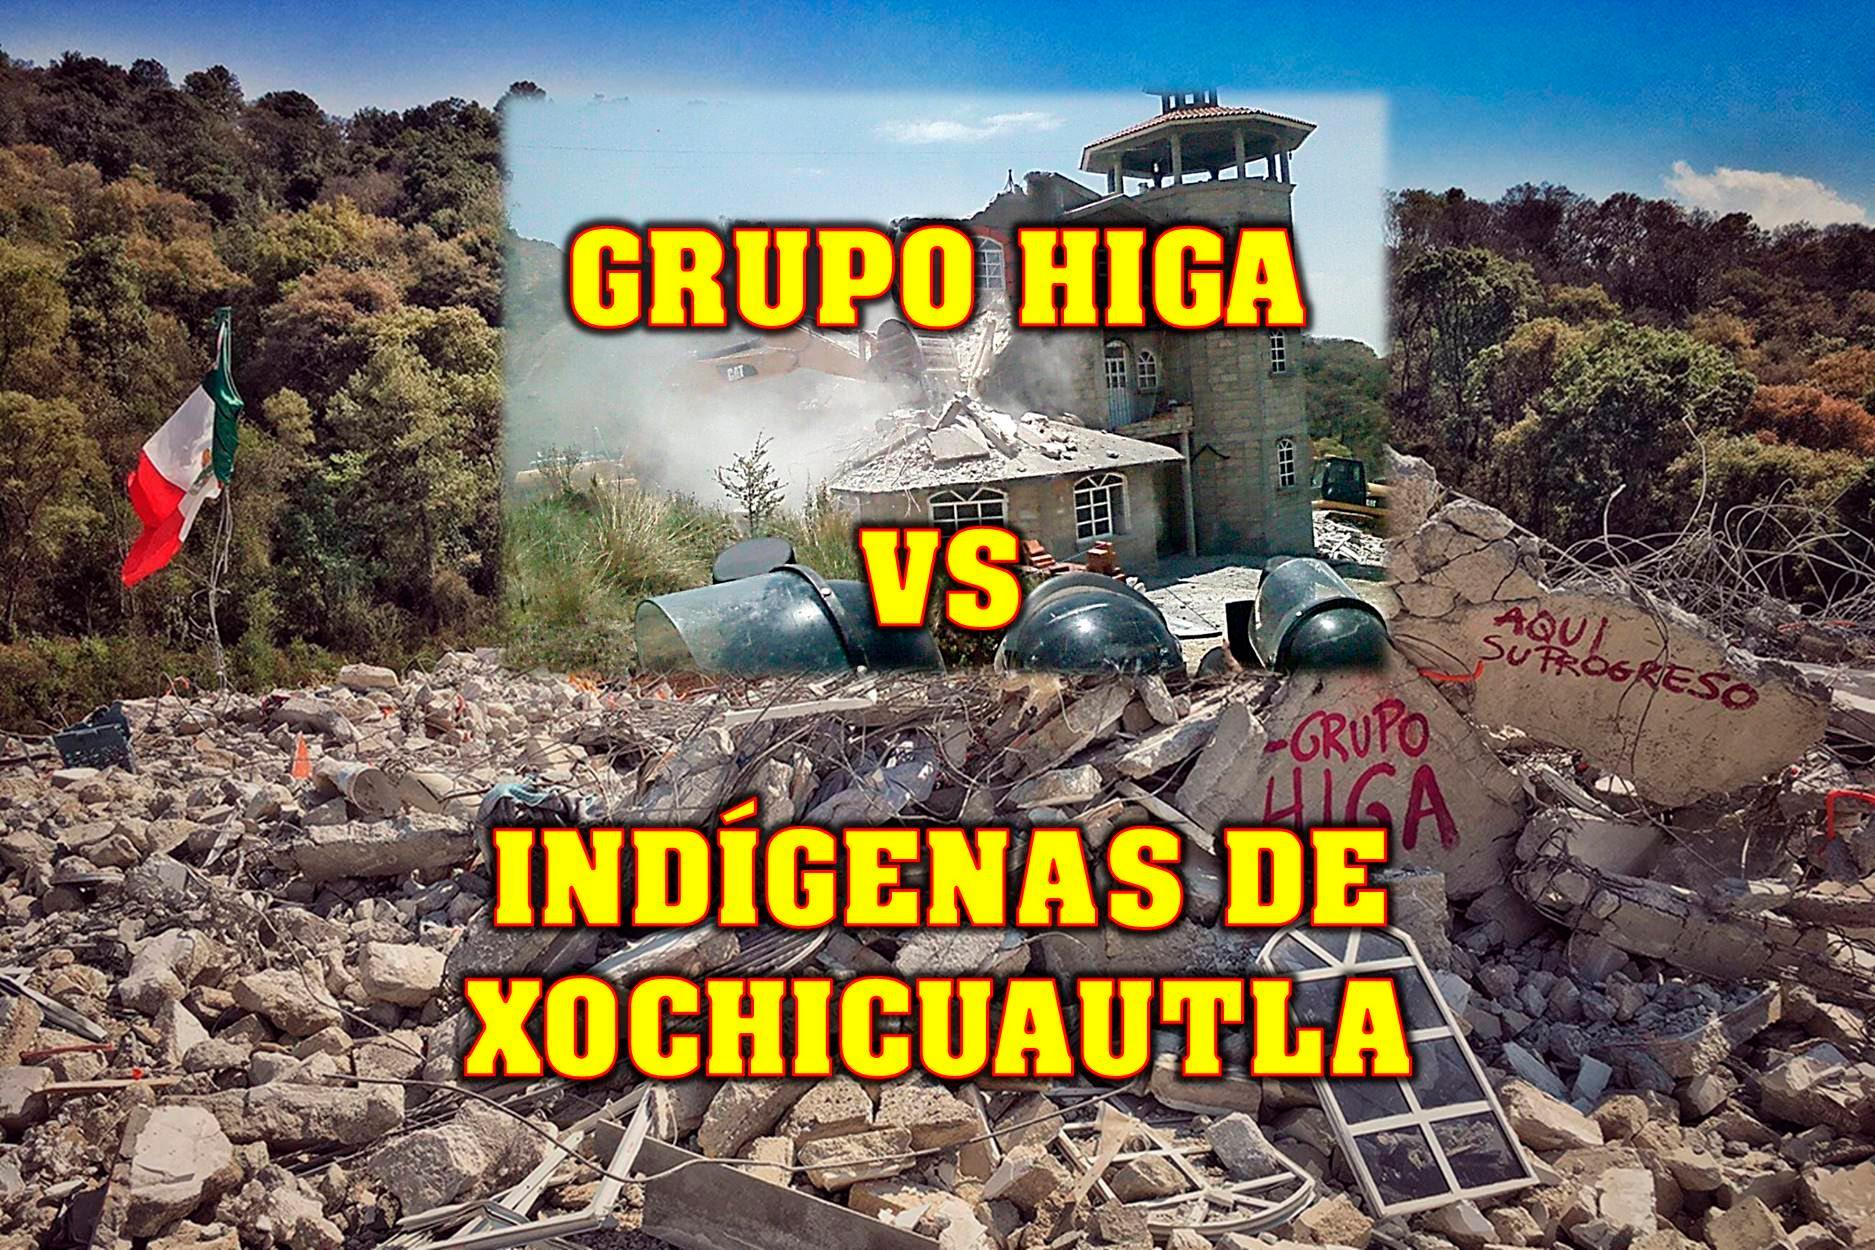 grupo-higa-contra-xochicuautla-edomex